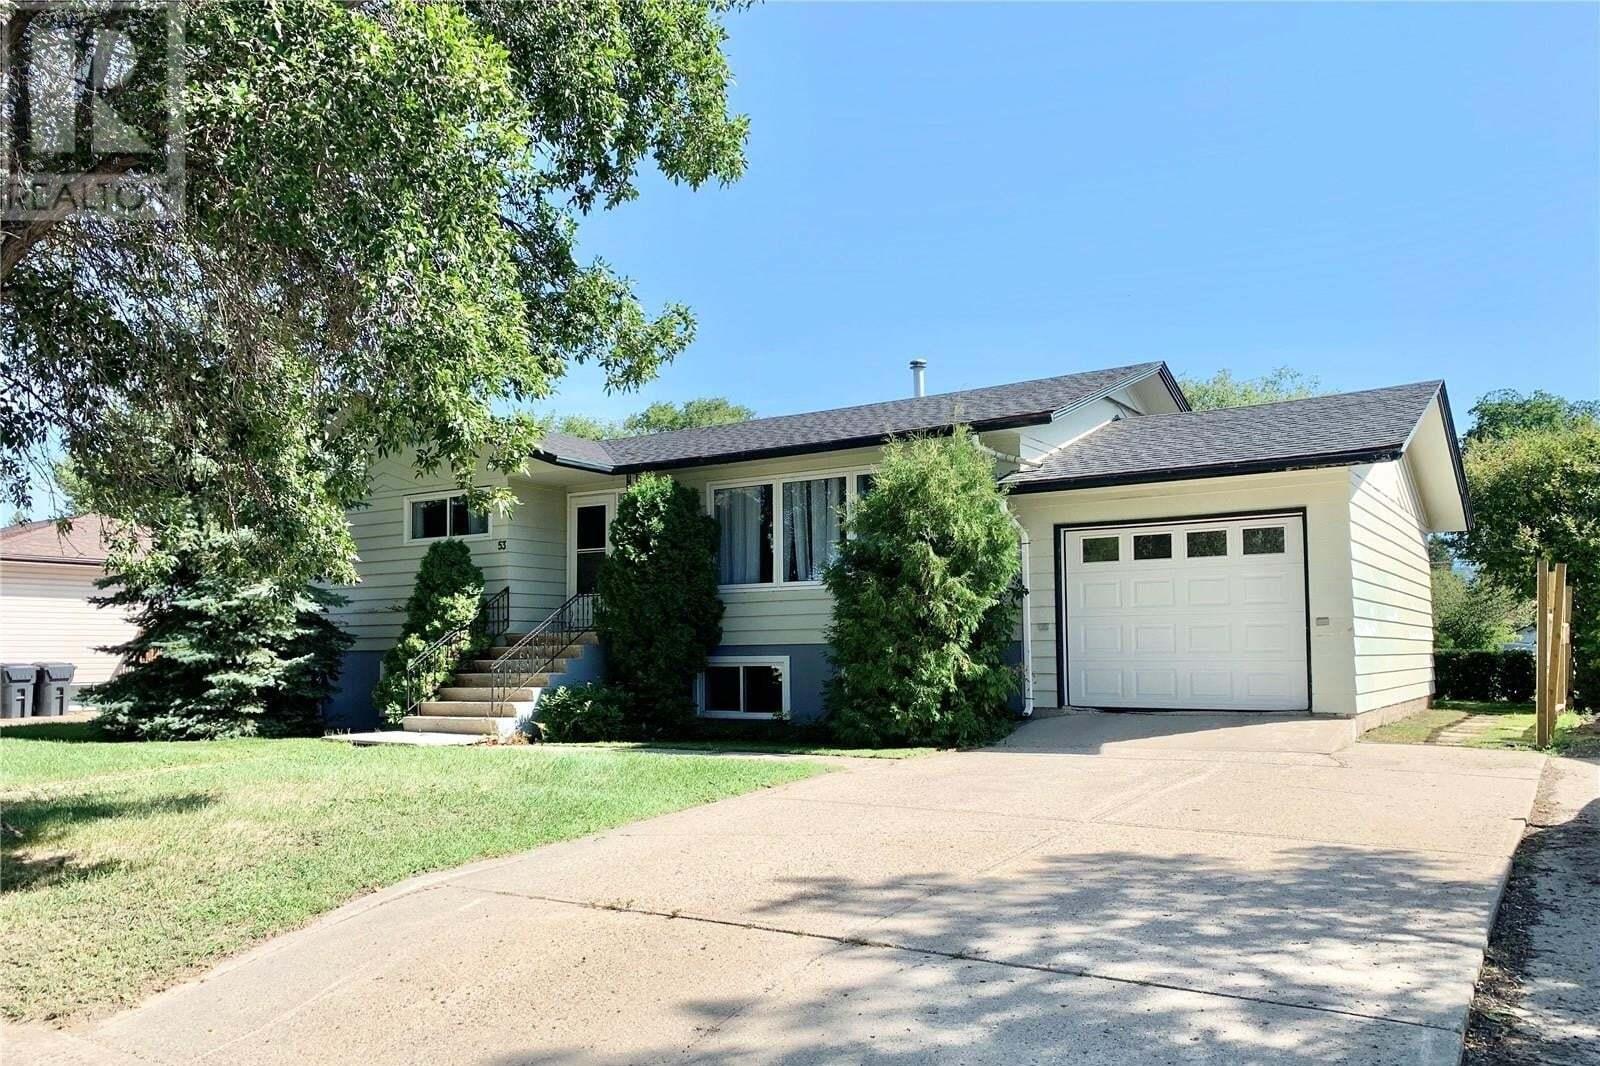 House for sale at 53 Bradbrooke Dr Yorkton Saskatchewan - MLS: SK824380